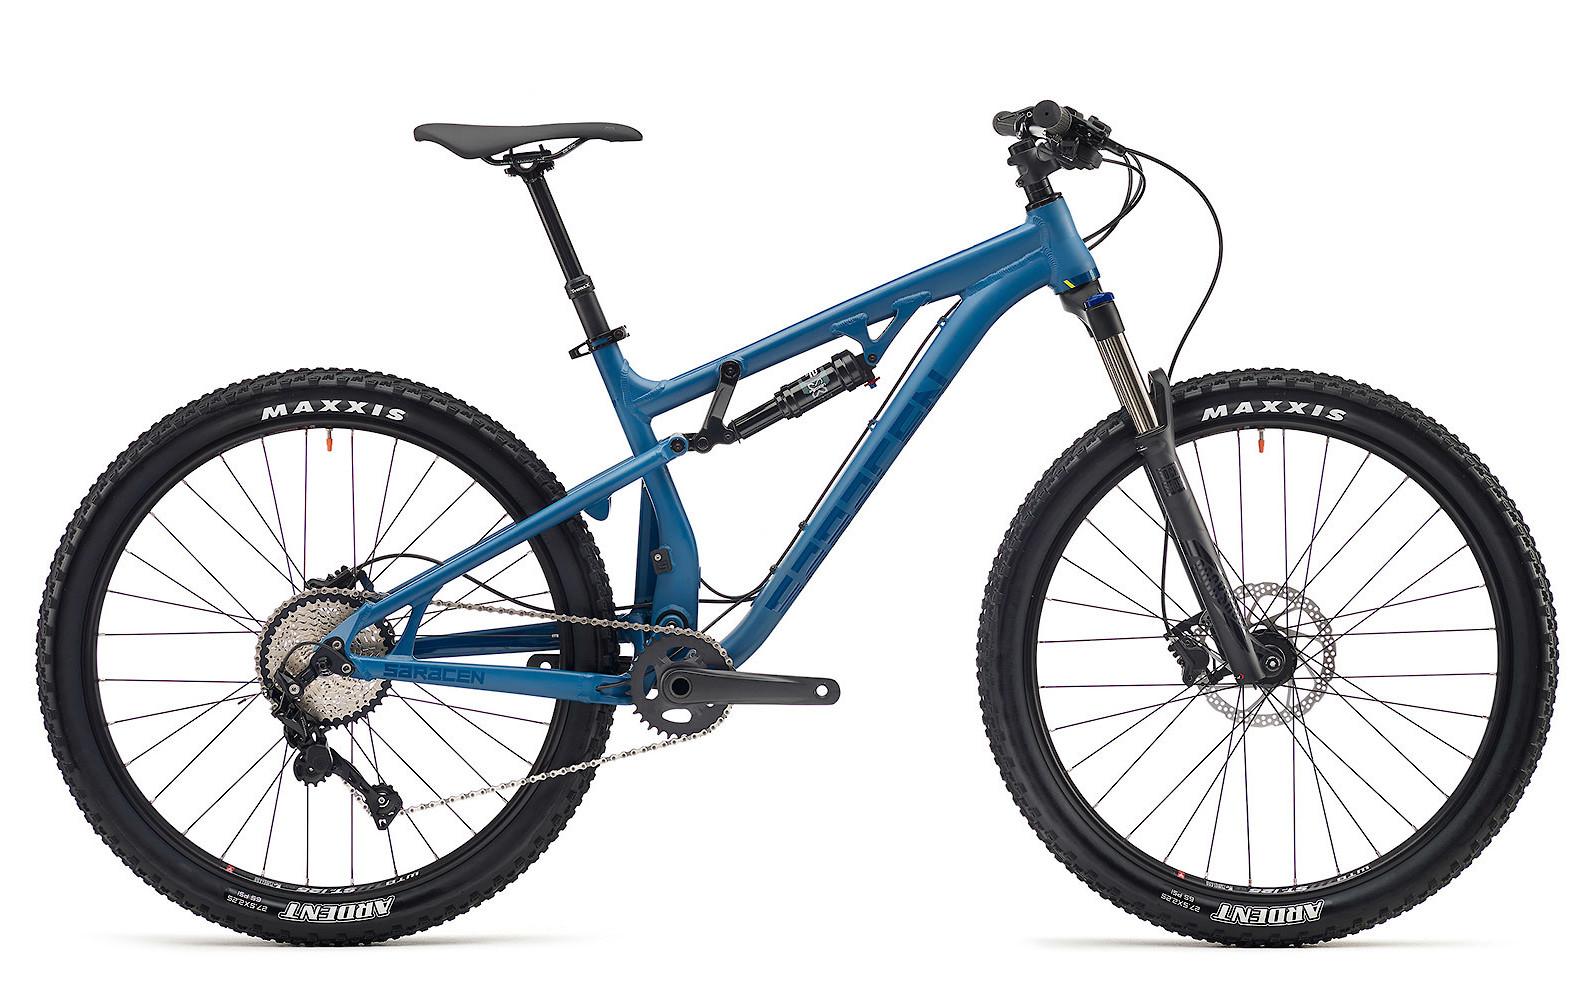 2019 Saracen Kili Flyer Bike